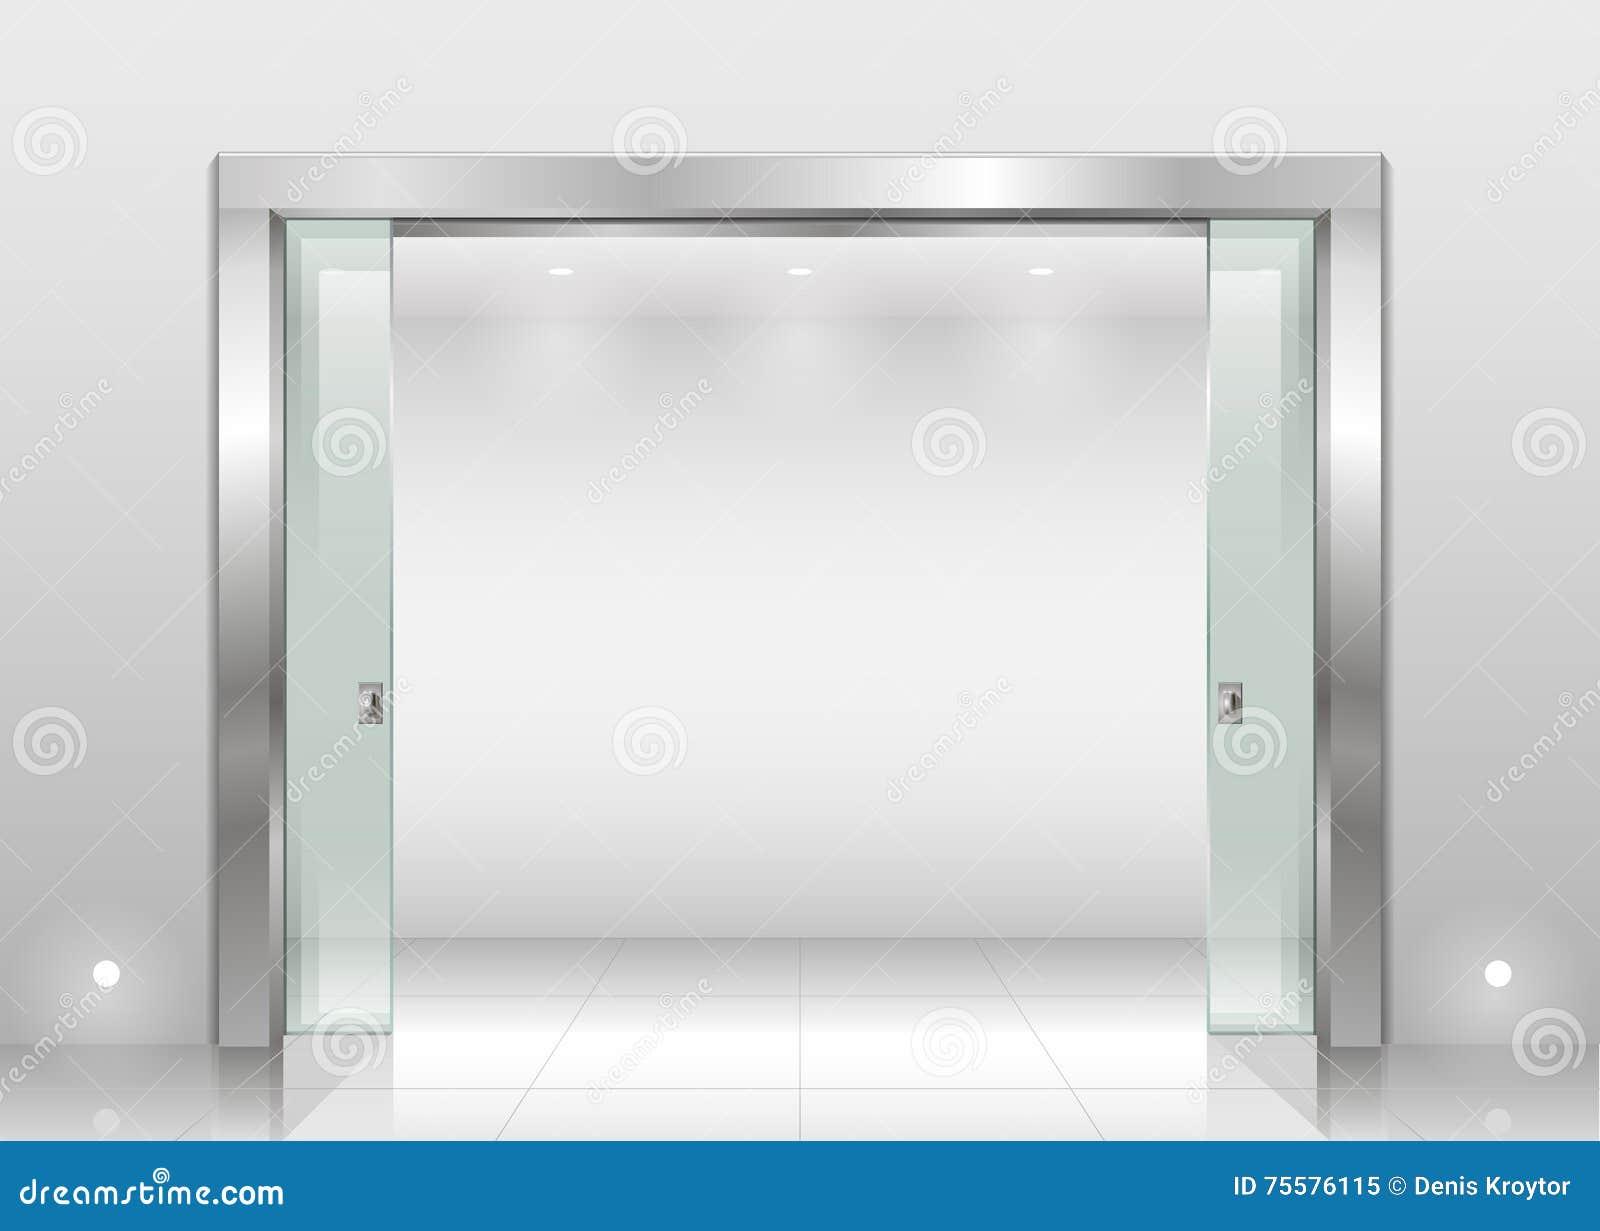 Steel Portal And Sliding Door Stock Vector Illustration Of Bank